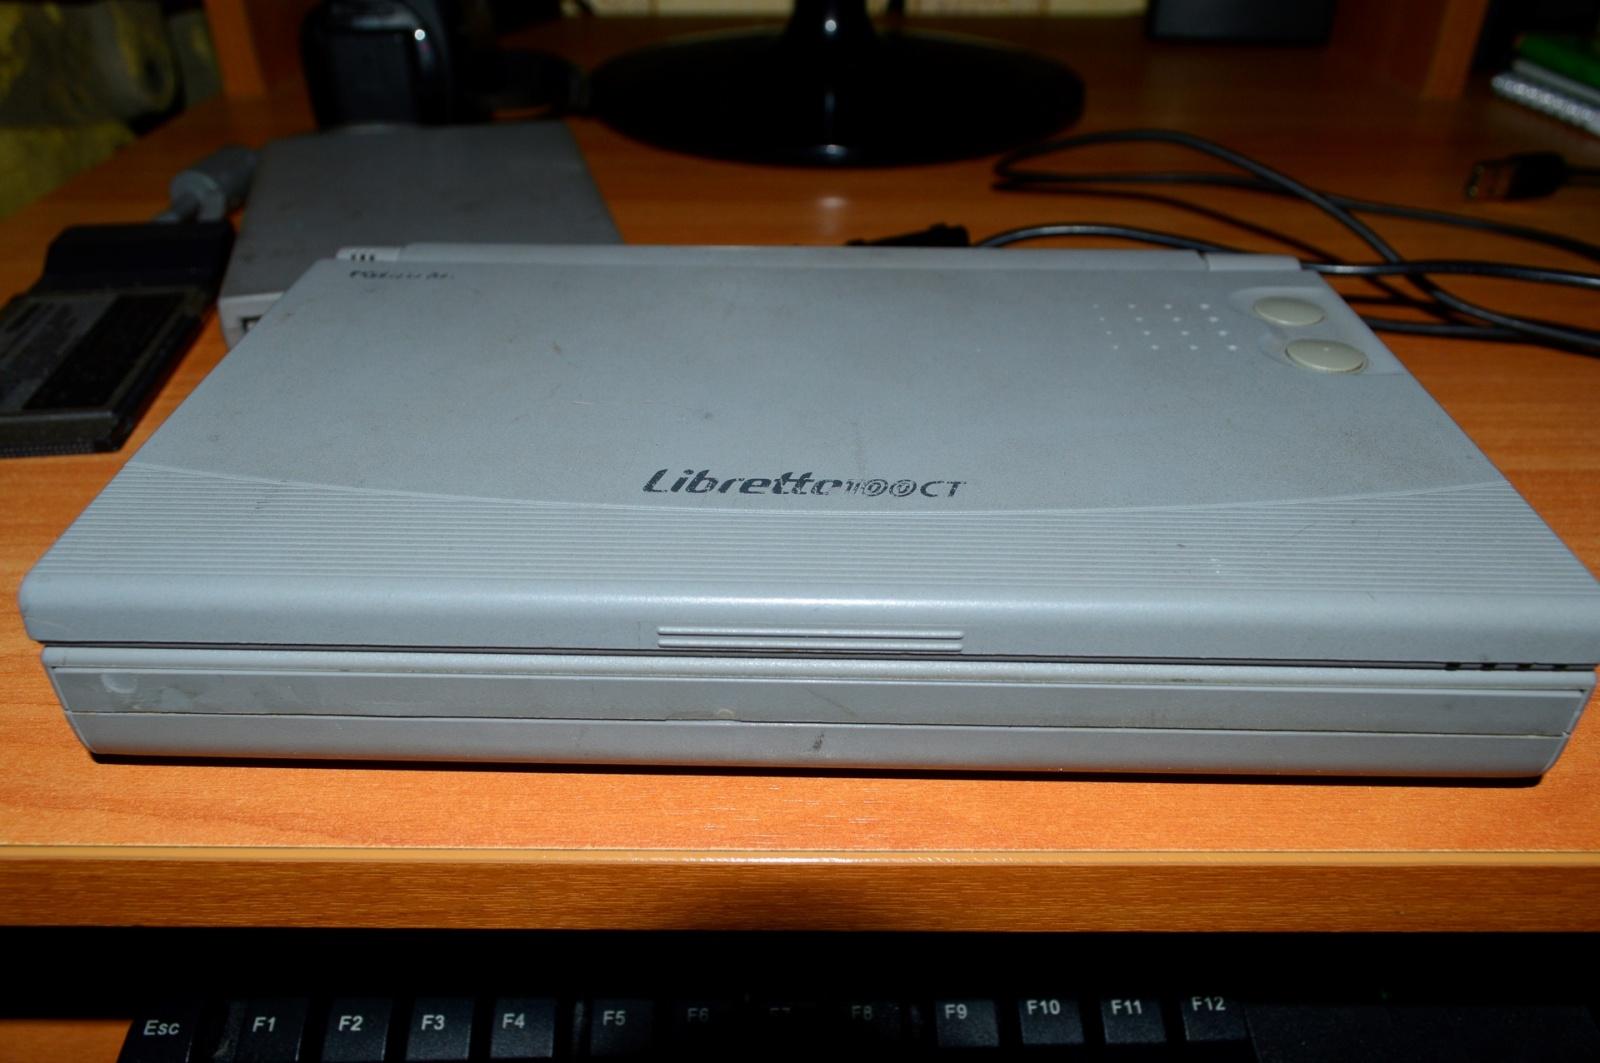 Какими были ноутбуки 20 лет назад на примере Toshiba libretto 100ct - 3